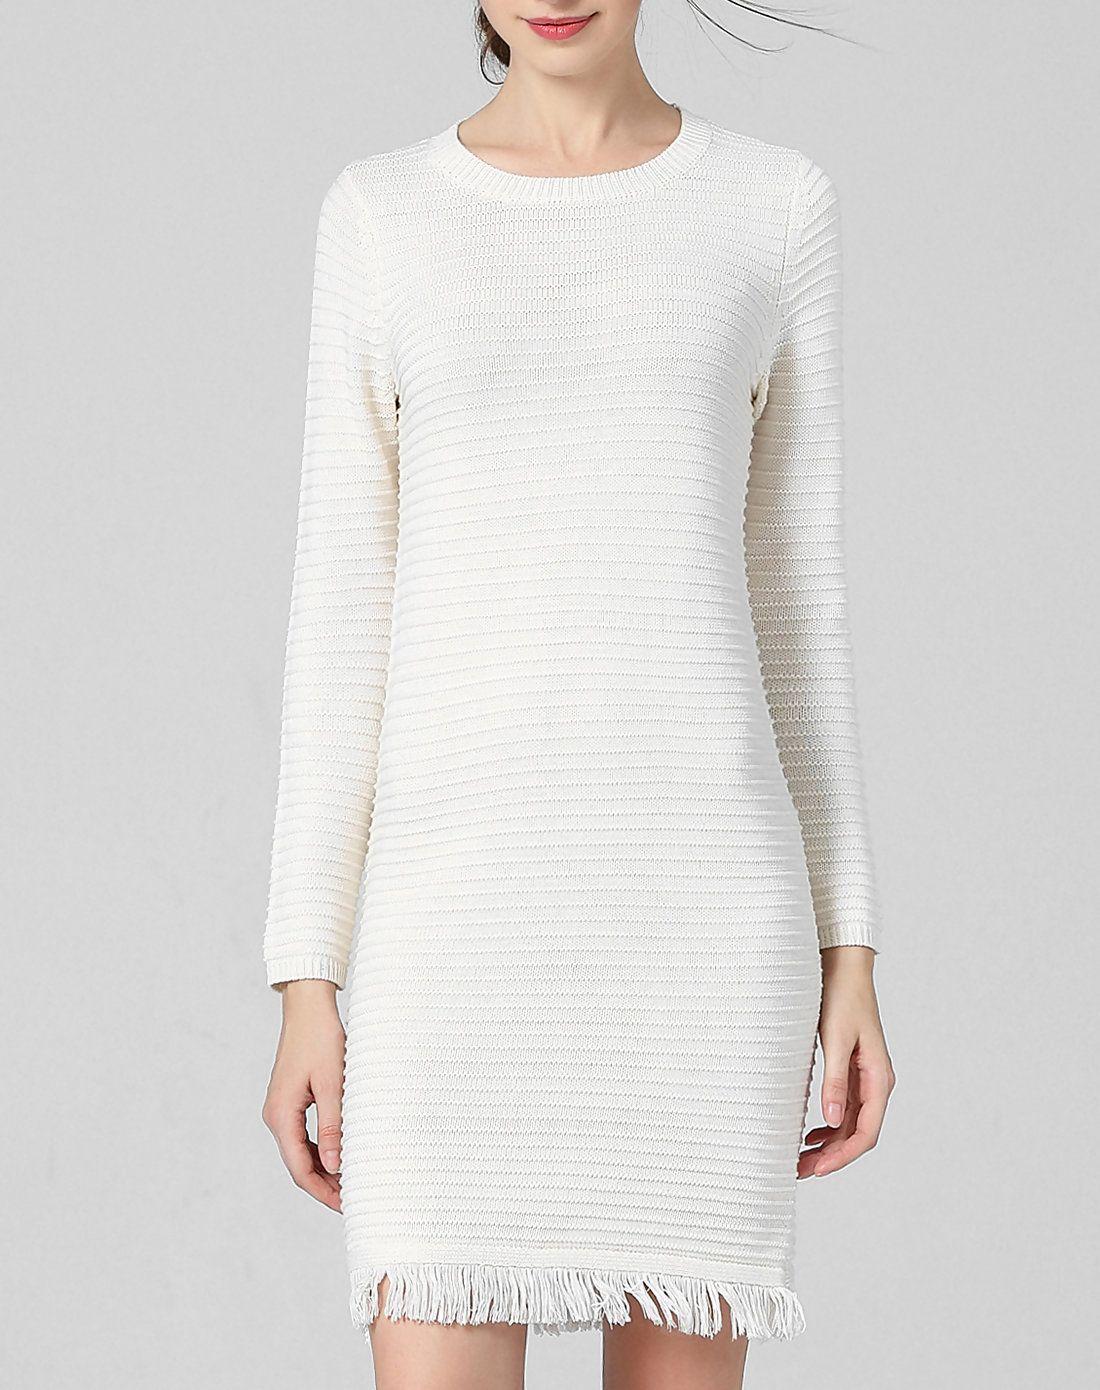 #AdoreWe #VIPme Sweater Dresses - wei guo yue White Grew Neck Long Sleeve Knitted Mini Dress - AdoreWe.com